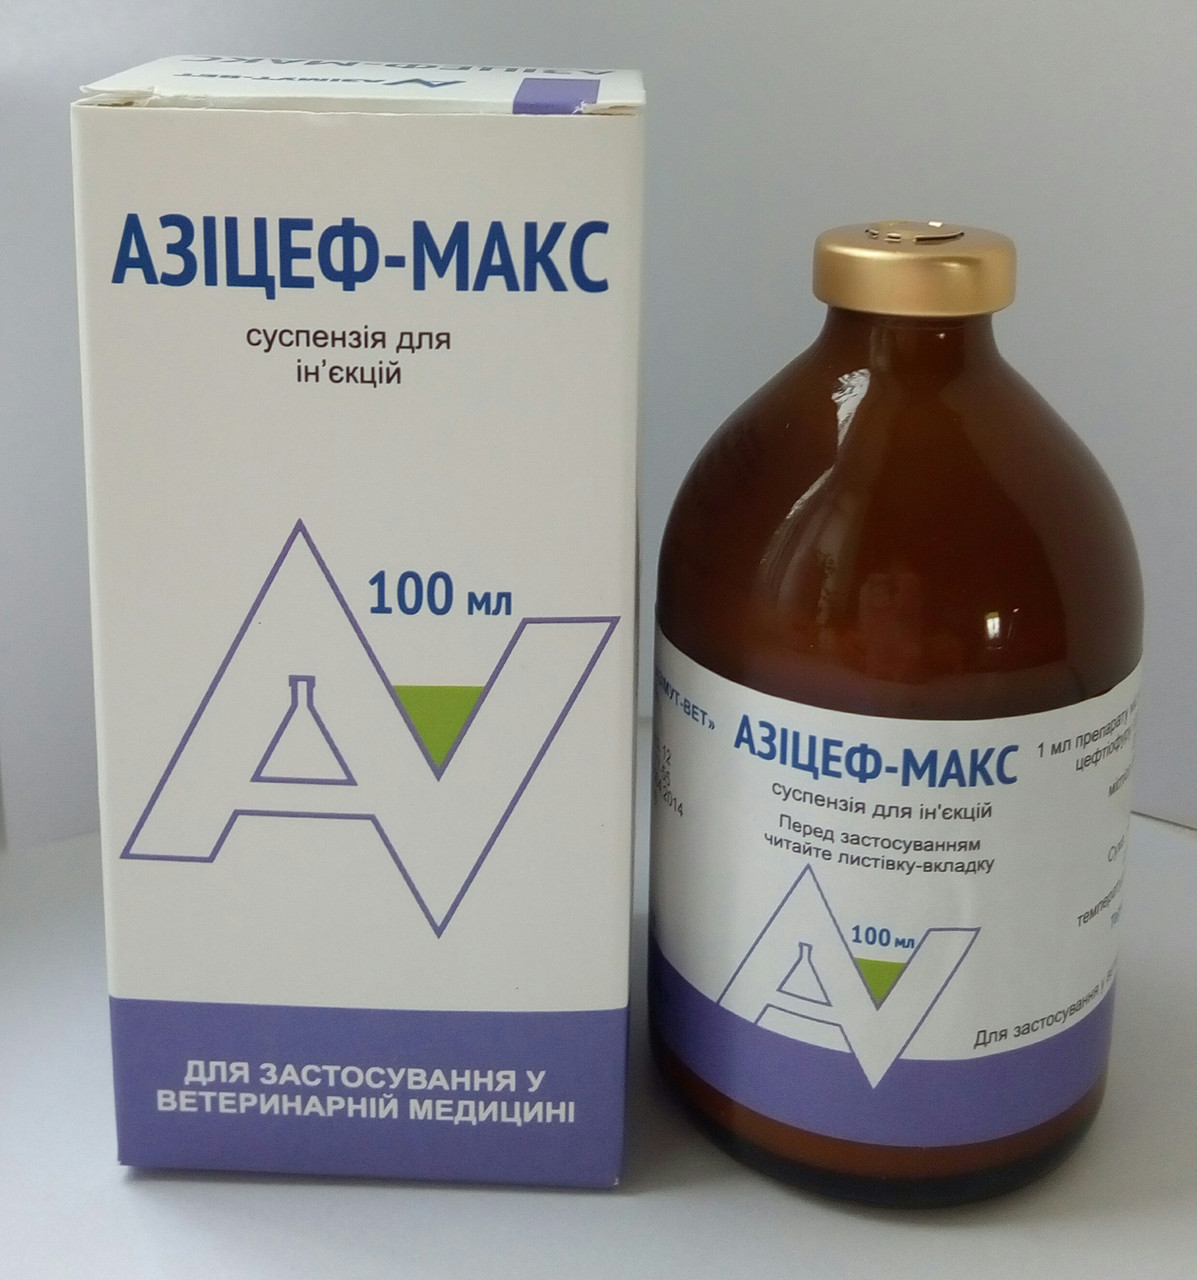 АЗИЦЕФ-МАКС 100 мл (цефтиофур 50 мг) антибиотик для живитных.